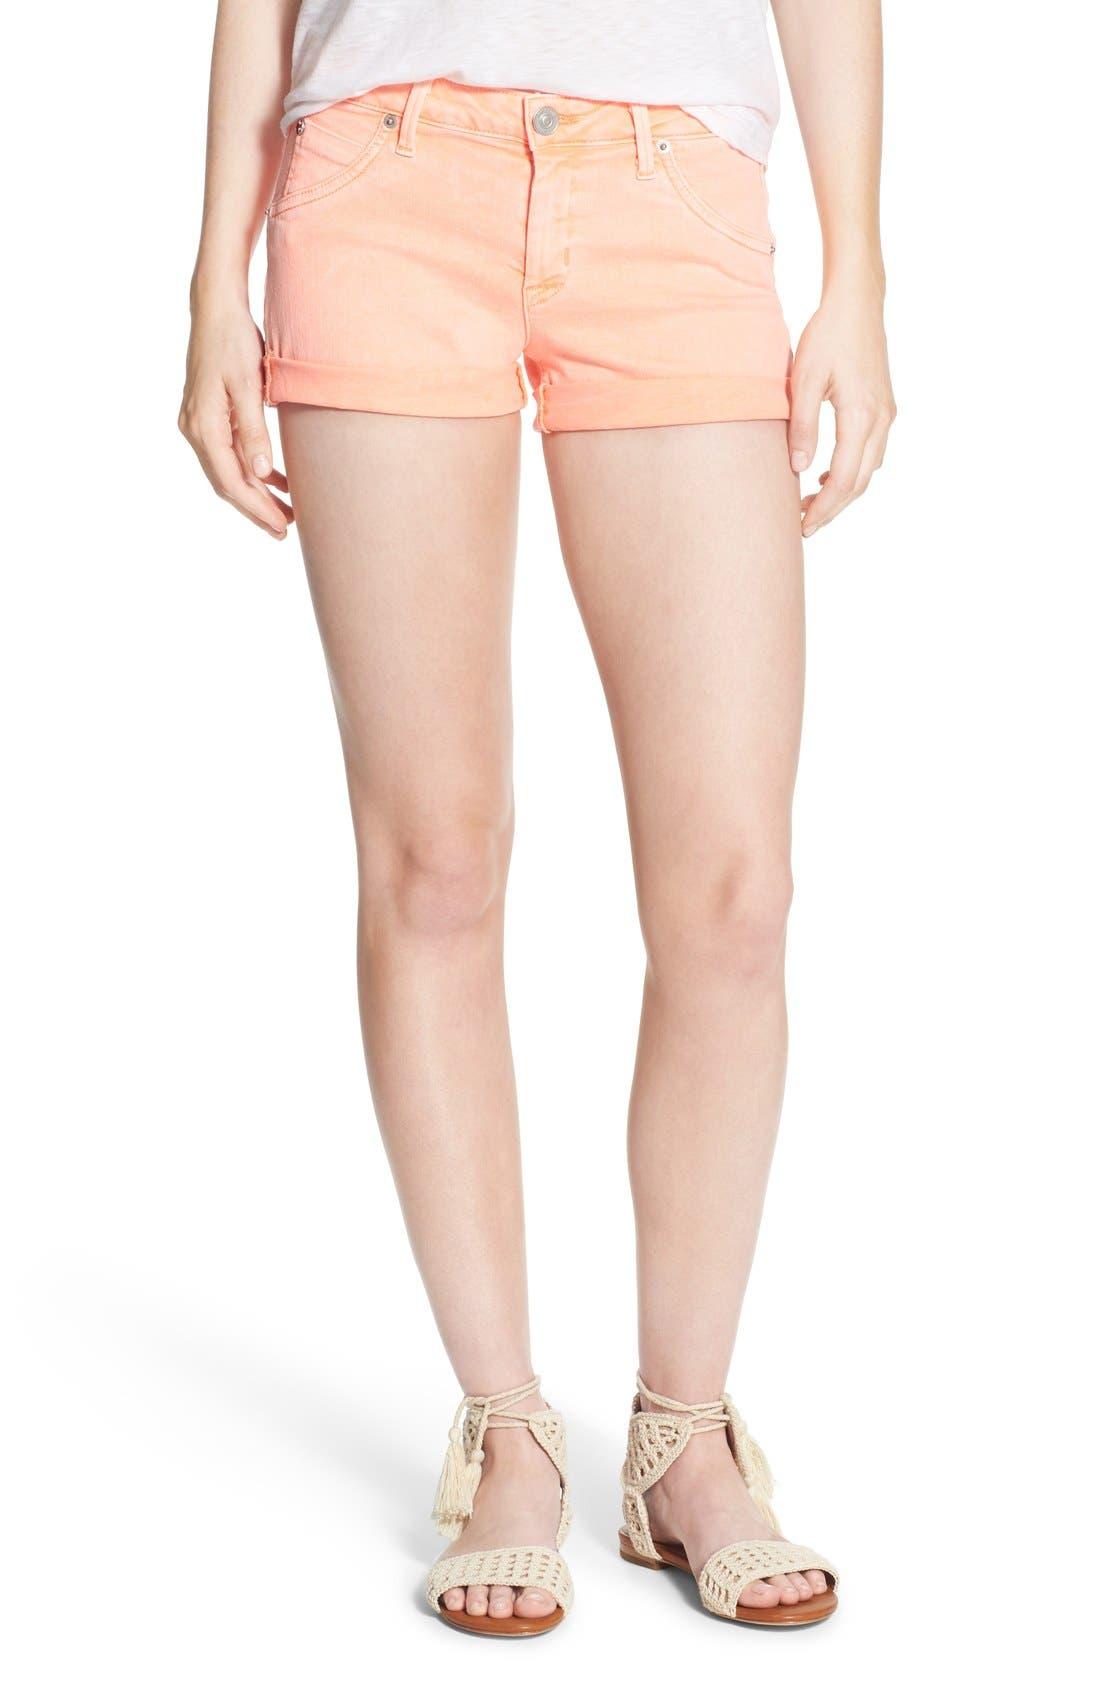 Alternate Image 1 Selected - Hudson Jeans 'Hampton' Cuffed Denim Shorts (Luminous Orange)